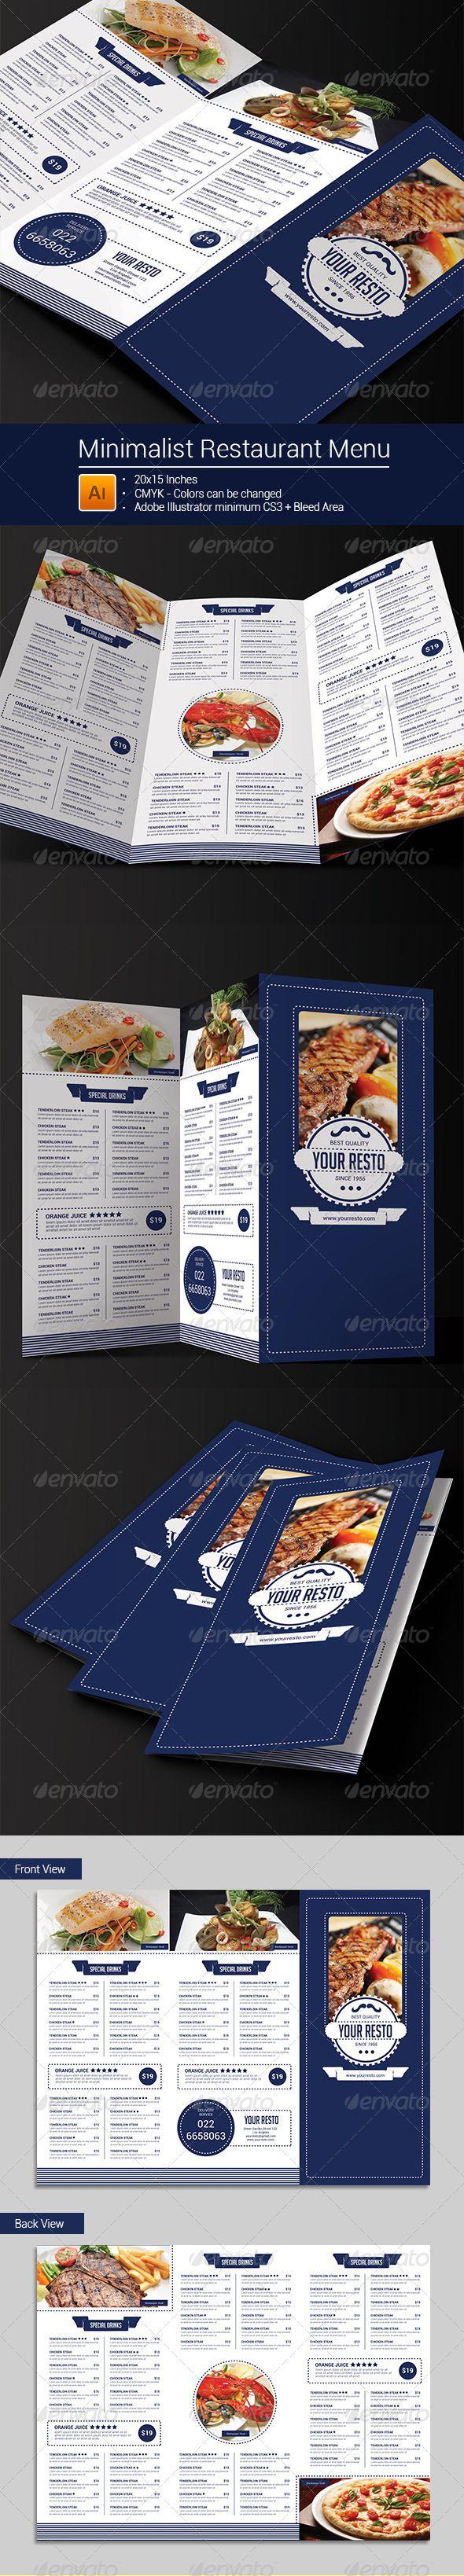 Minimalist Trifold Restaurant Menu Template #design #speisekarte Download: http://graphicriver.net/item/minimalist-trifold-restaurant-menu-/8245216?ref=ksioks